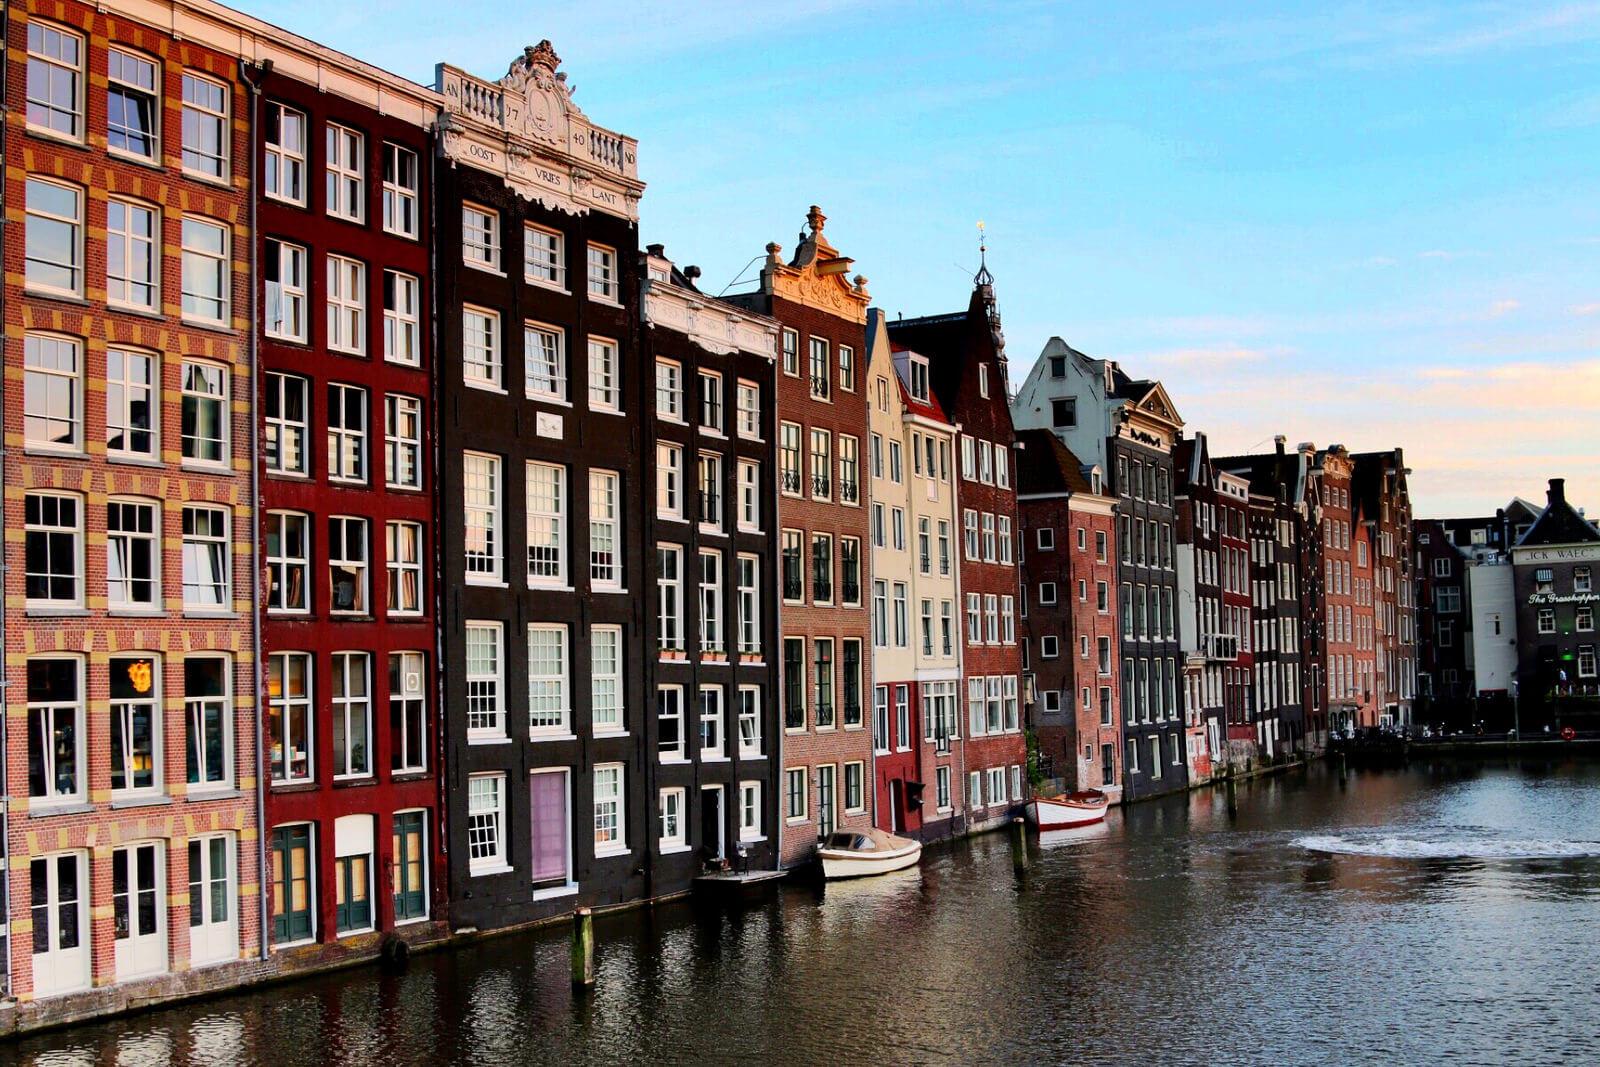 Node.js Interactive location: Amsterdam